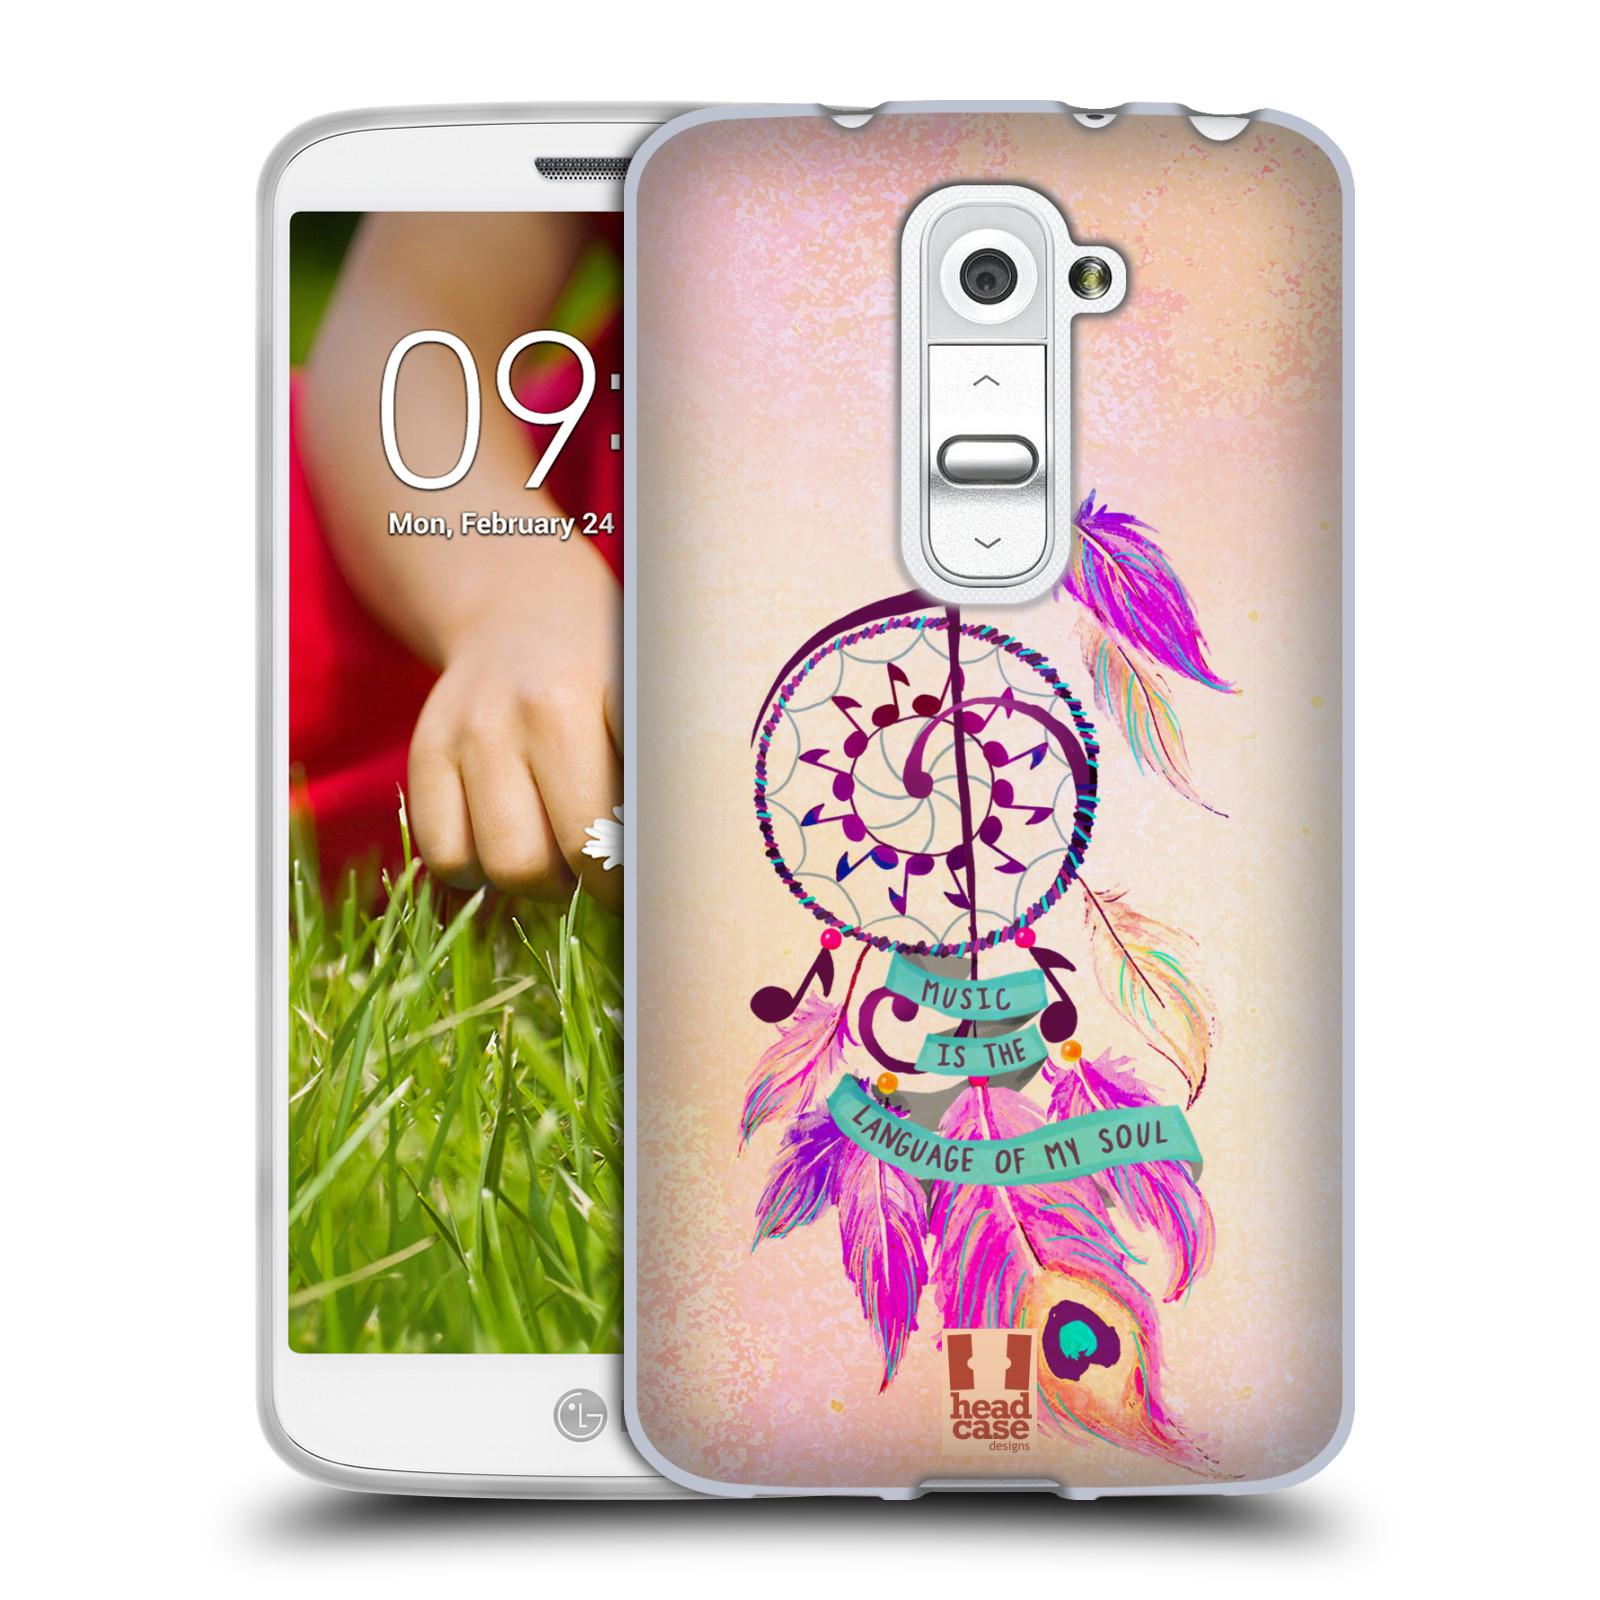 Silikonové pouzdro na mobil LG G2 Mini HEAD CASE Lapač Assorted Music (Silikonový kryt či obal na mobilní telefon LG G2 Mini D620)